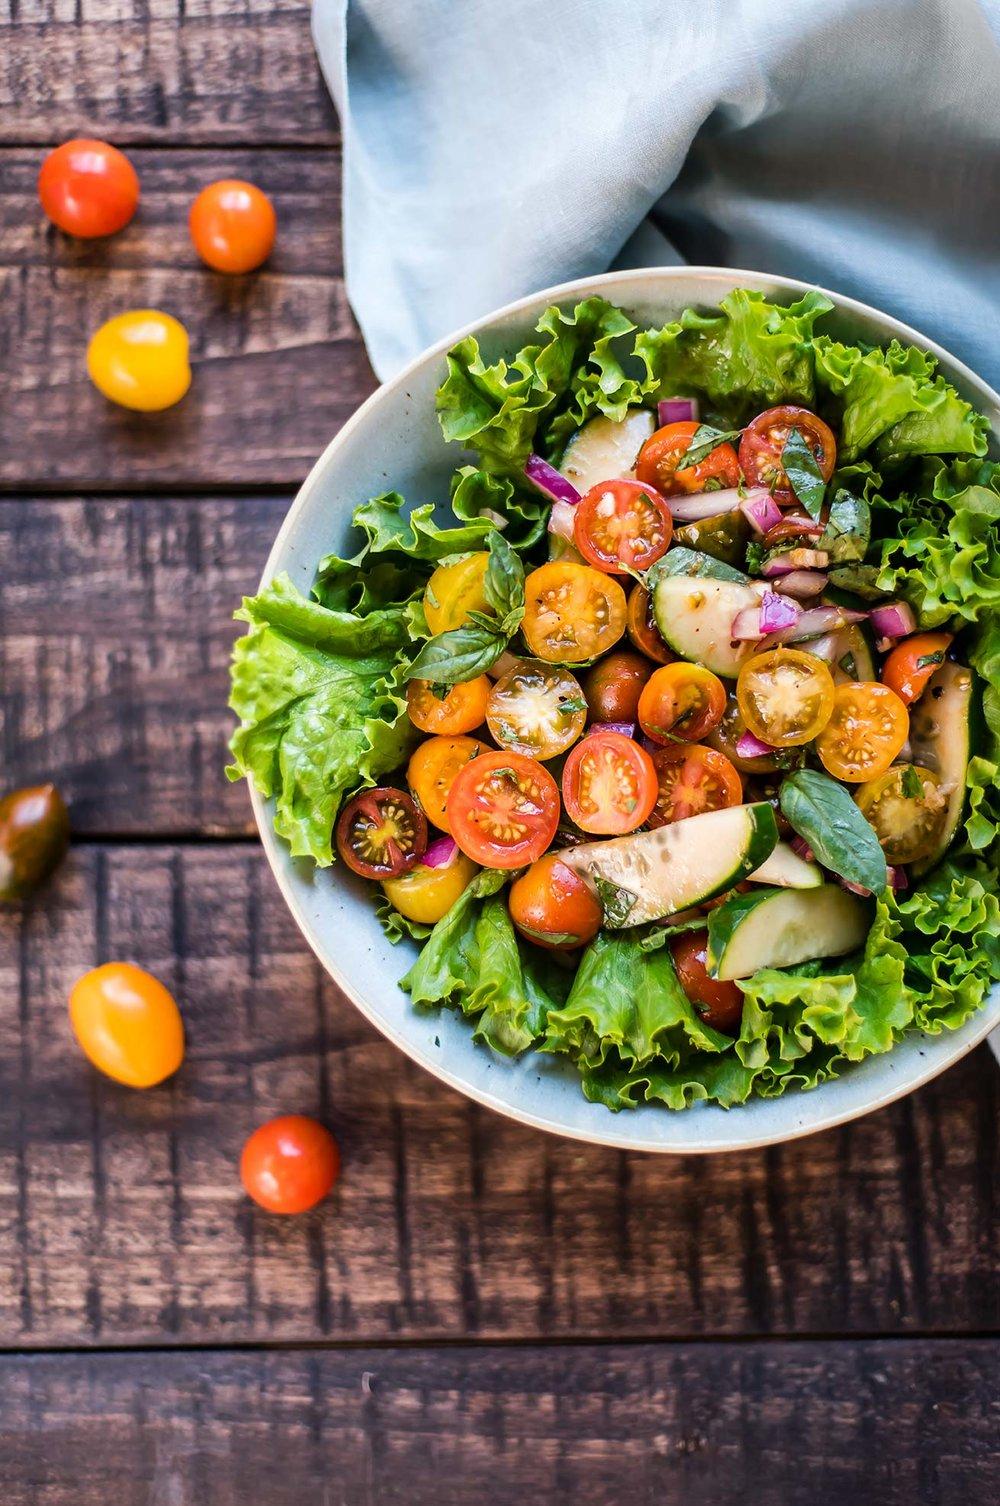 Marinated Cherry Tomato Salad